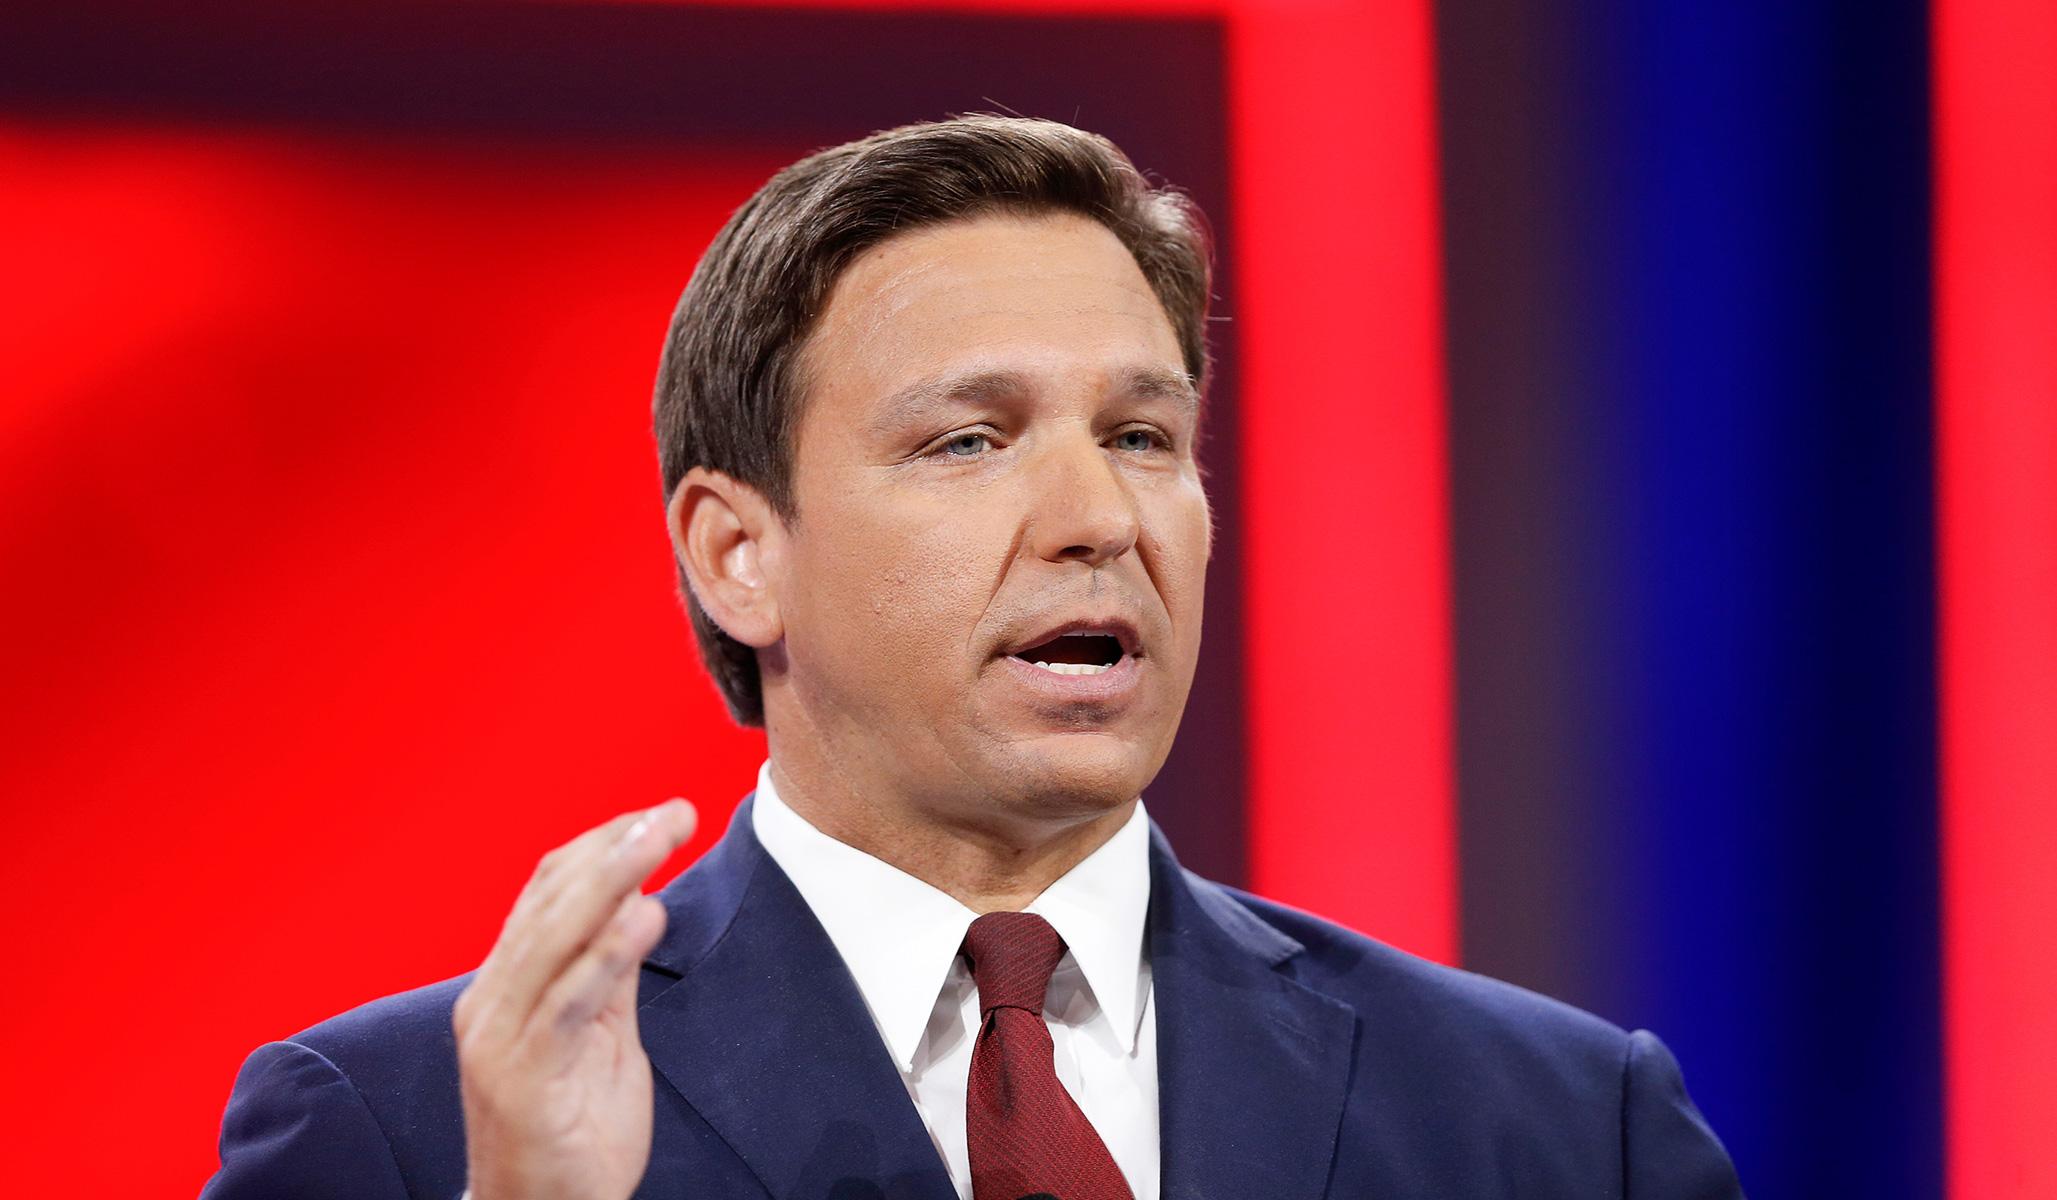 Florida Appeals Court Rules in Favor of Gov. Ron DeSantis to Allow Ban on School Mask Mandates